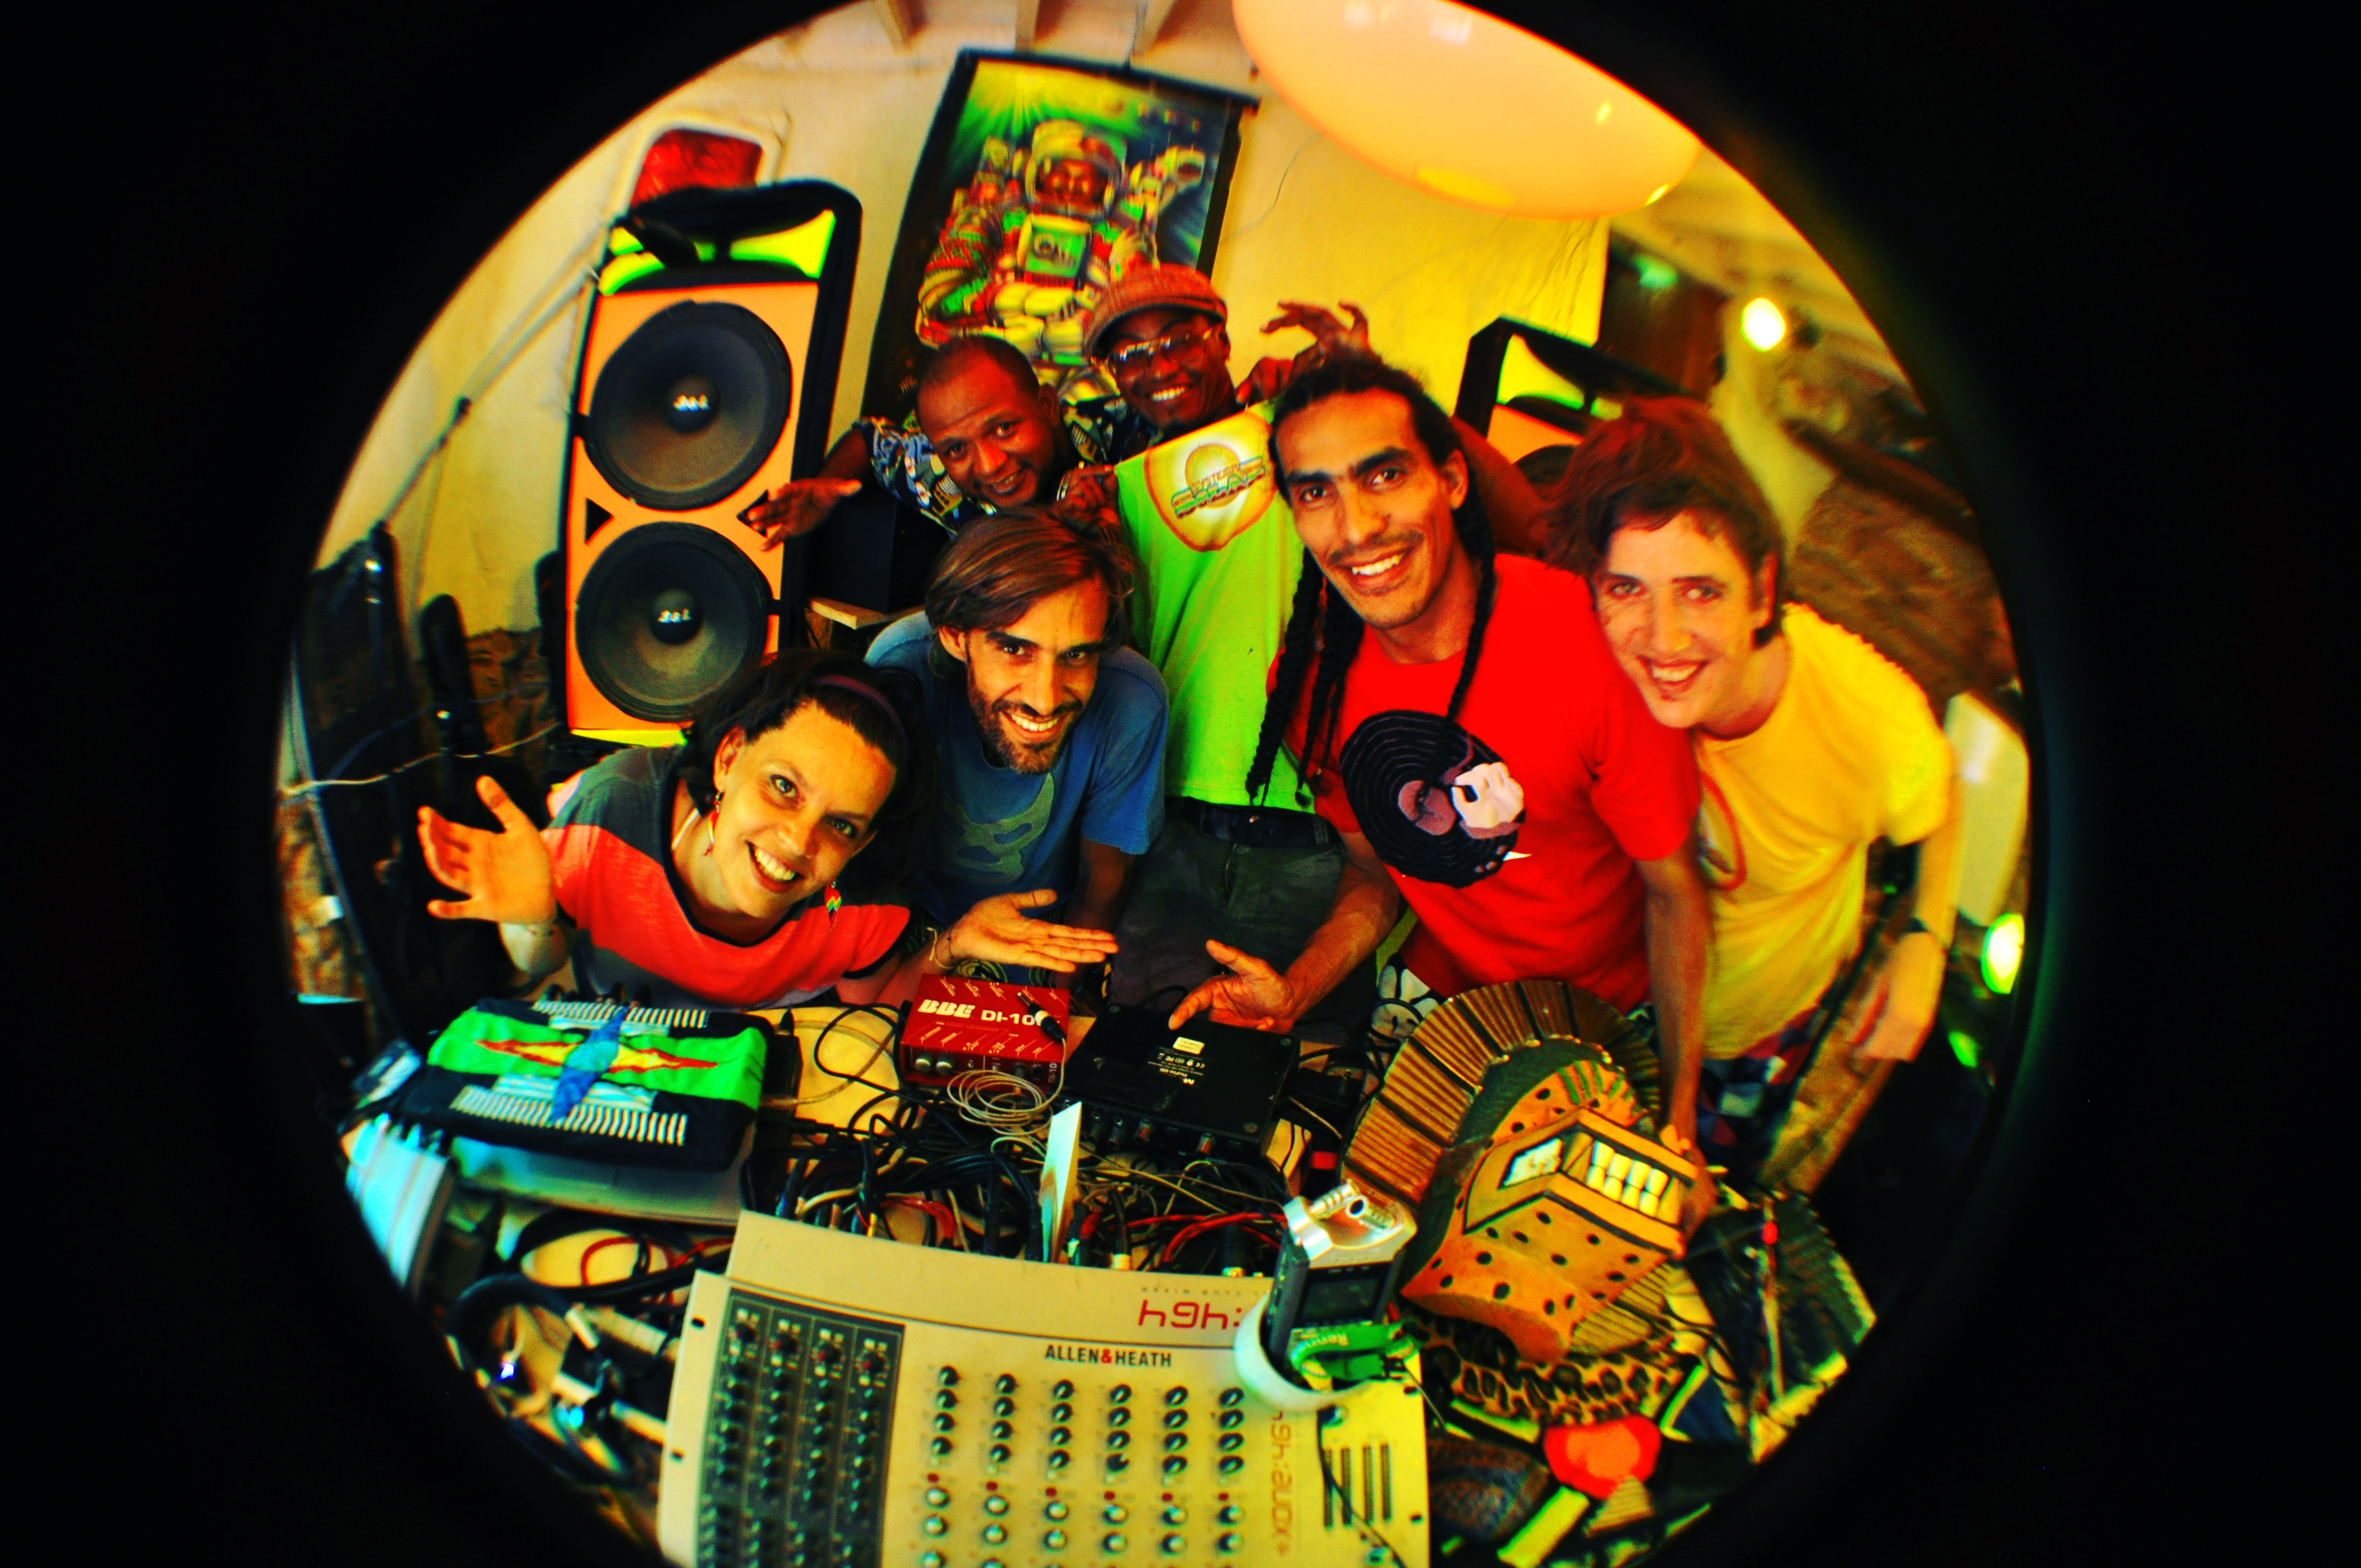 solar system disco lyrics romaji - photo #44